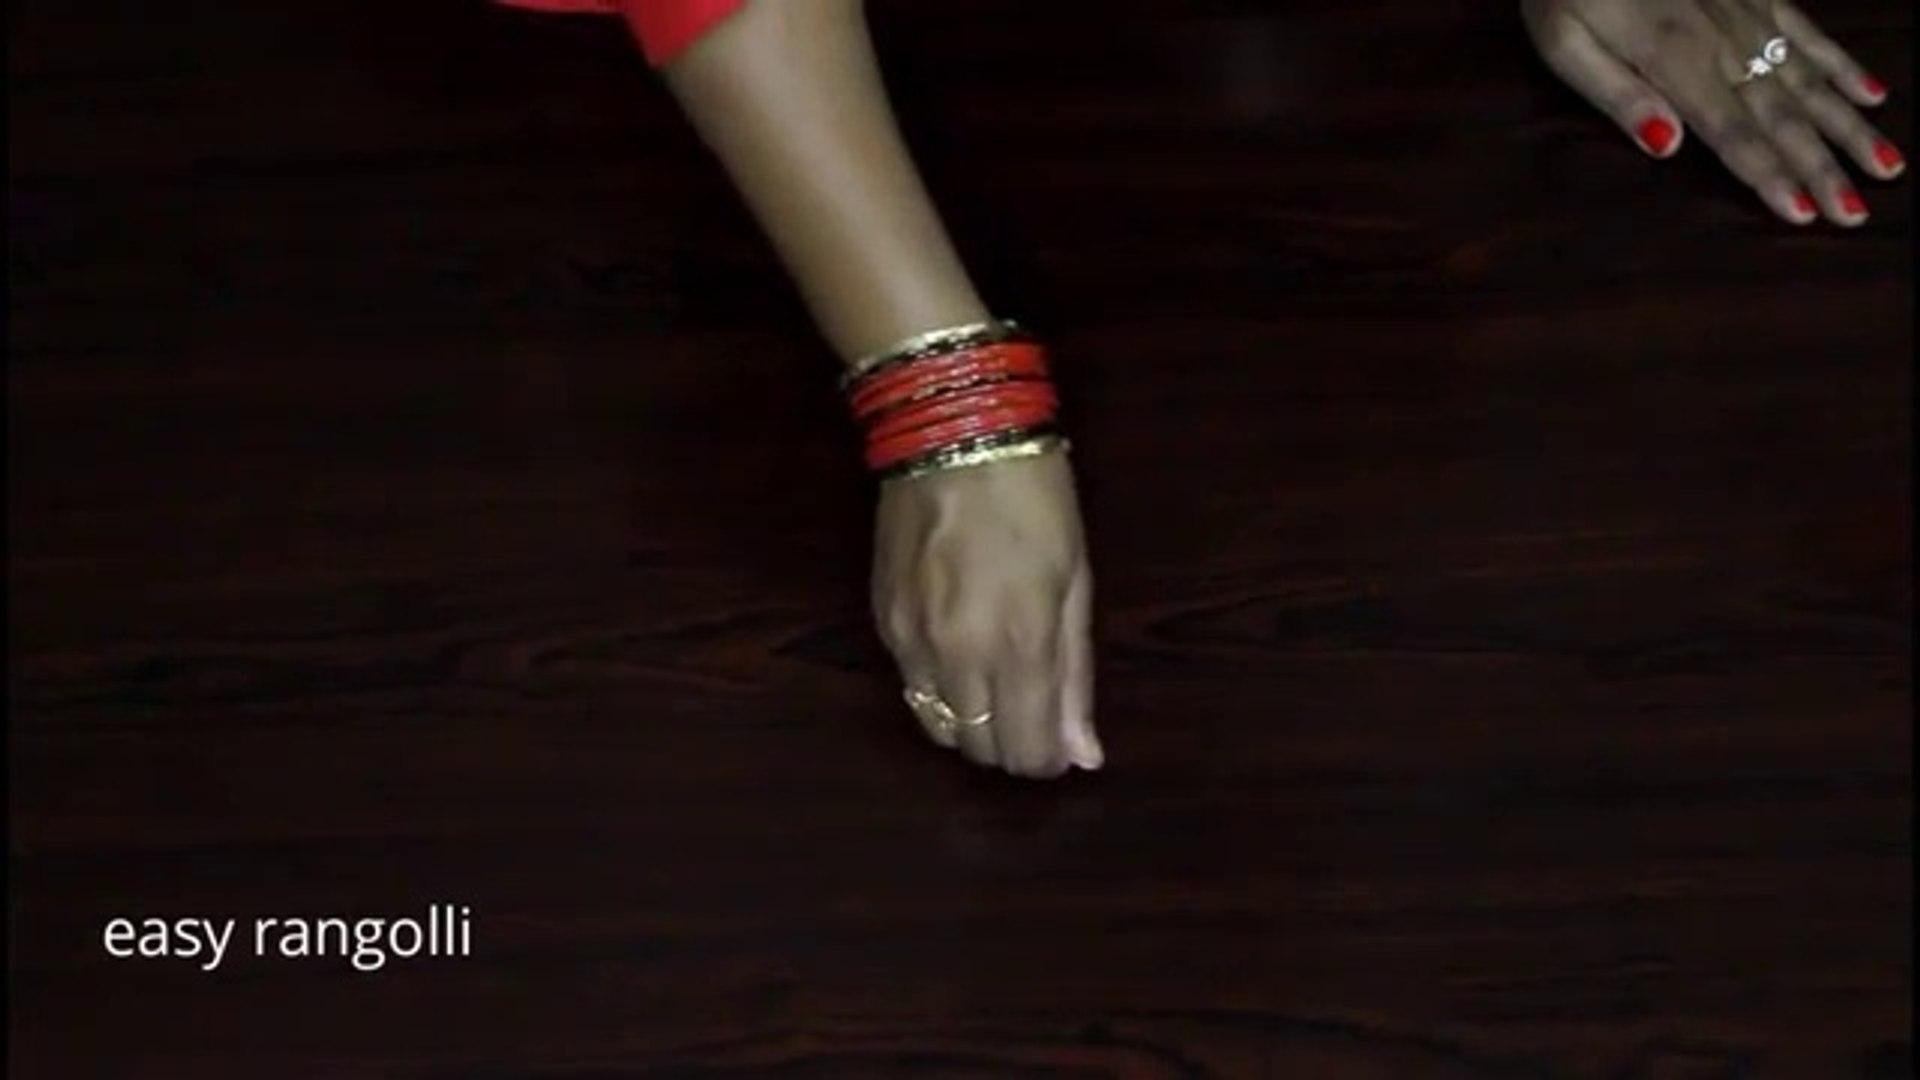 Amazing freehand muggulu designs    daily routine rangoli    easy & simple kolam    indian arts